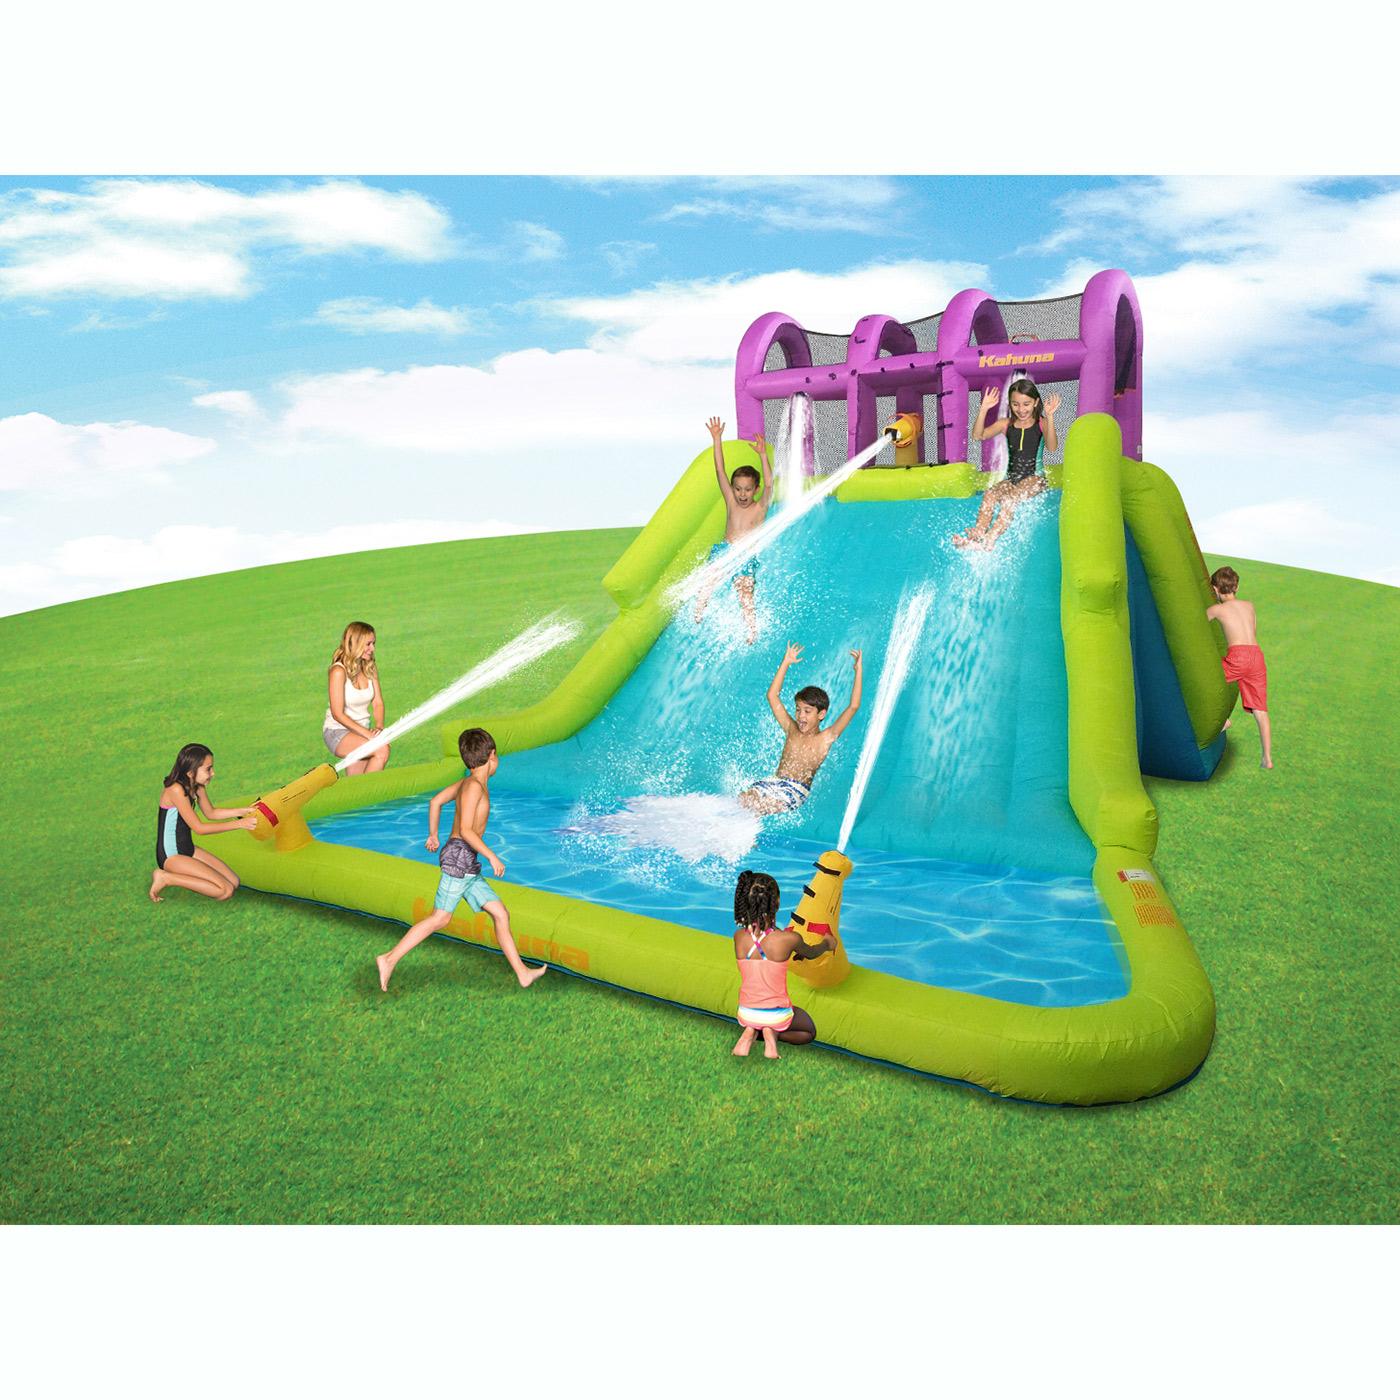 Intex Kids Backyard Fun Play Pool Volleyball Game Slide Inflatable Center Sum... Bälle